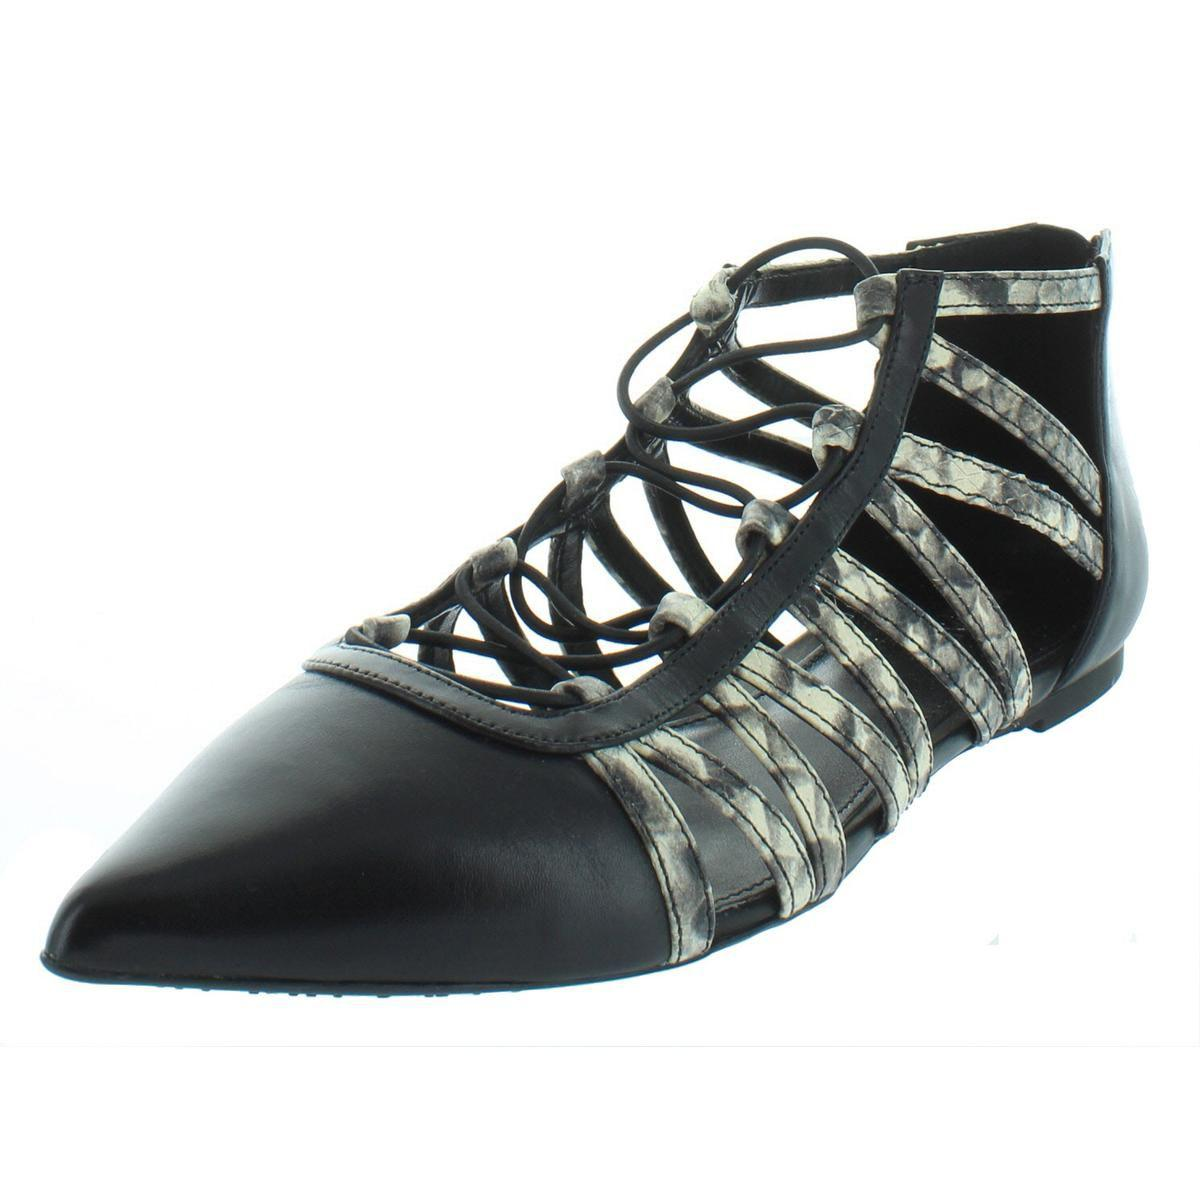 cd2c77c84914 Lyst - Michael Michael Kors Womens Clarissa Leather Dress Flats in Black